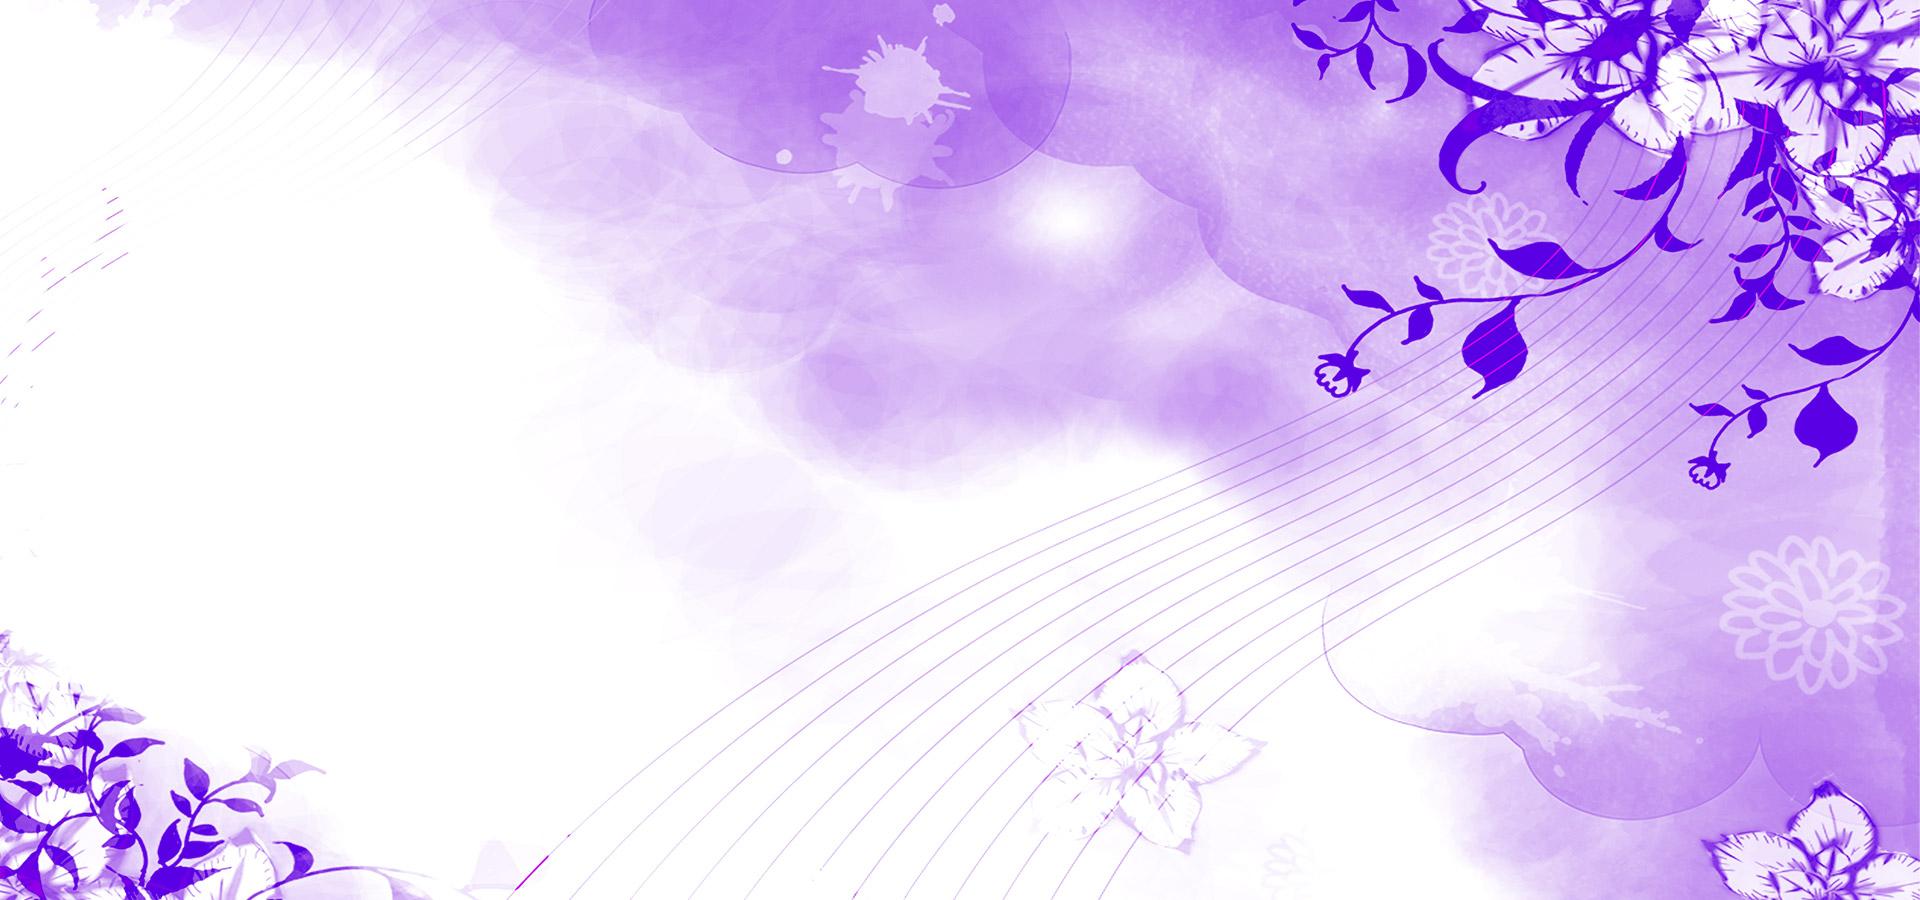 motif d arri u00e8re plan violet arri u00e8re plan fond mat u00e9riau de